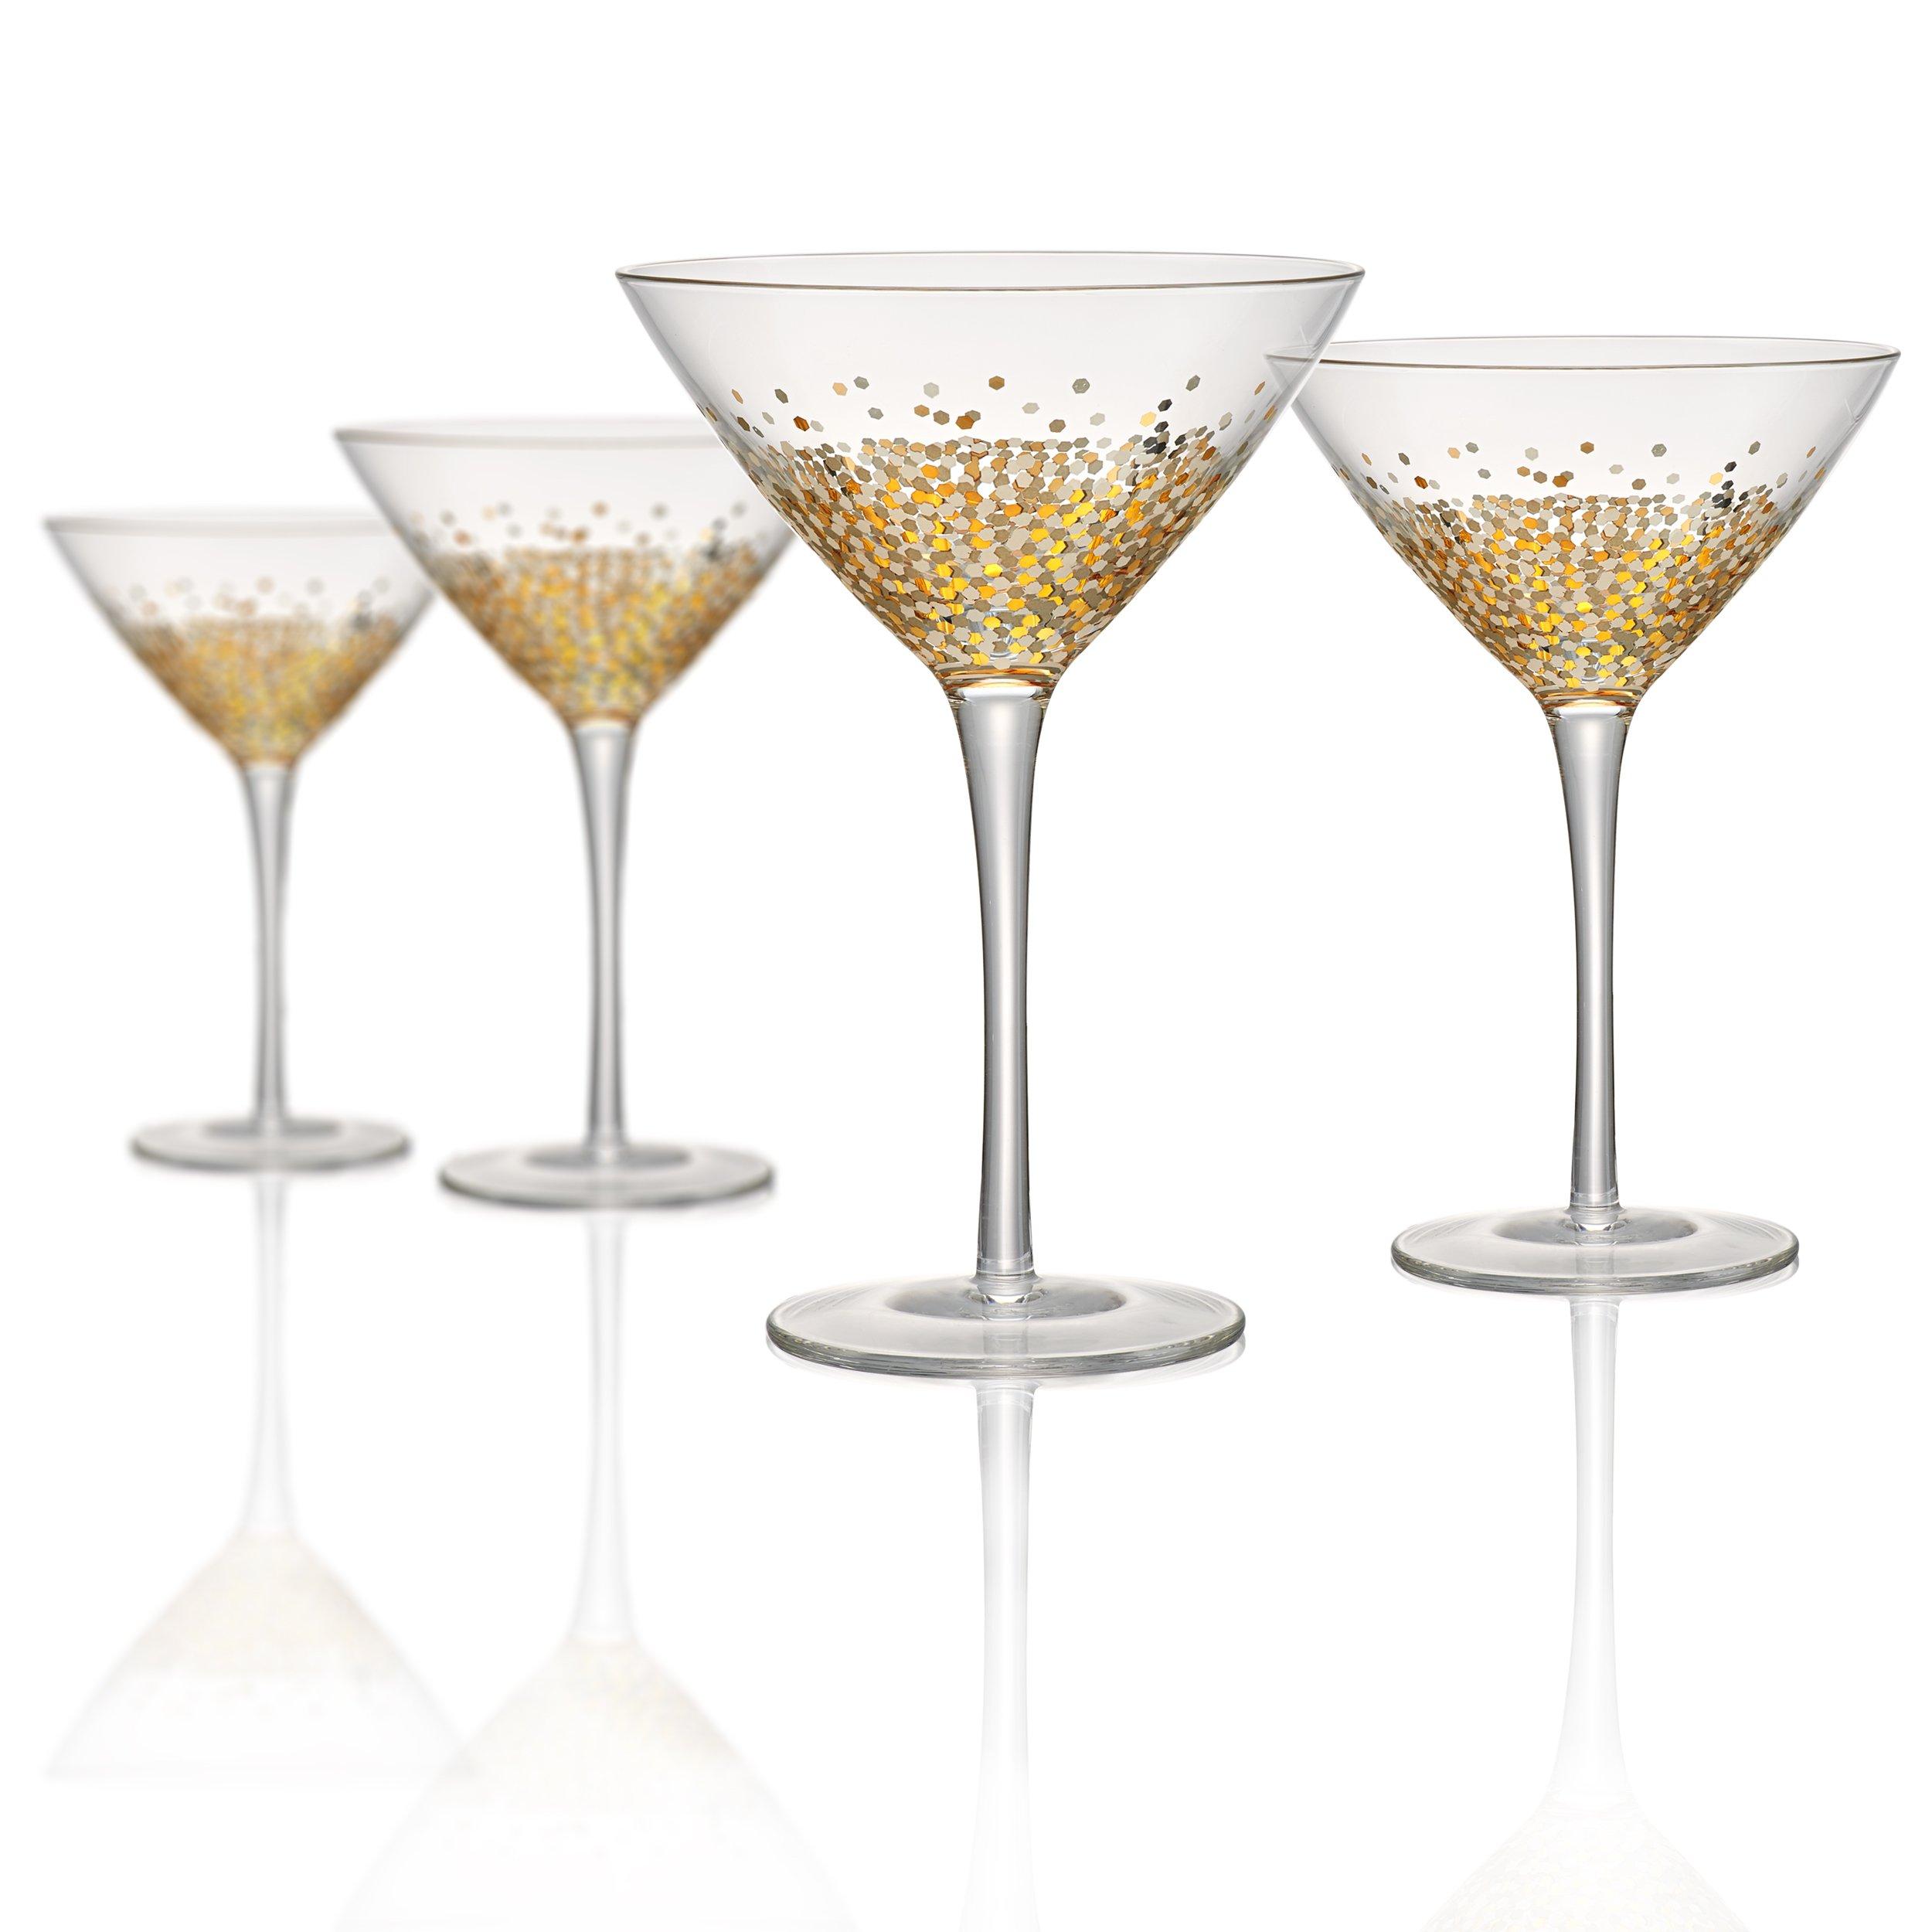 Artland Ambrosia martini 10 oz (Set of 4), Gold/Silver